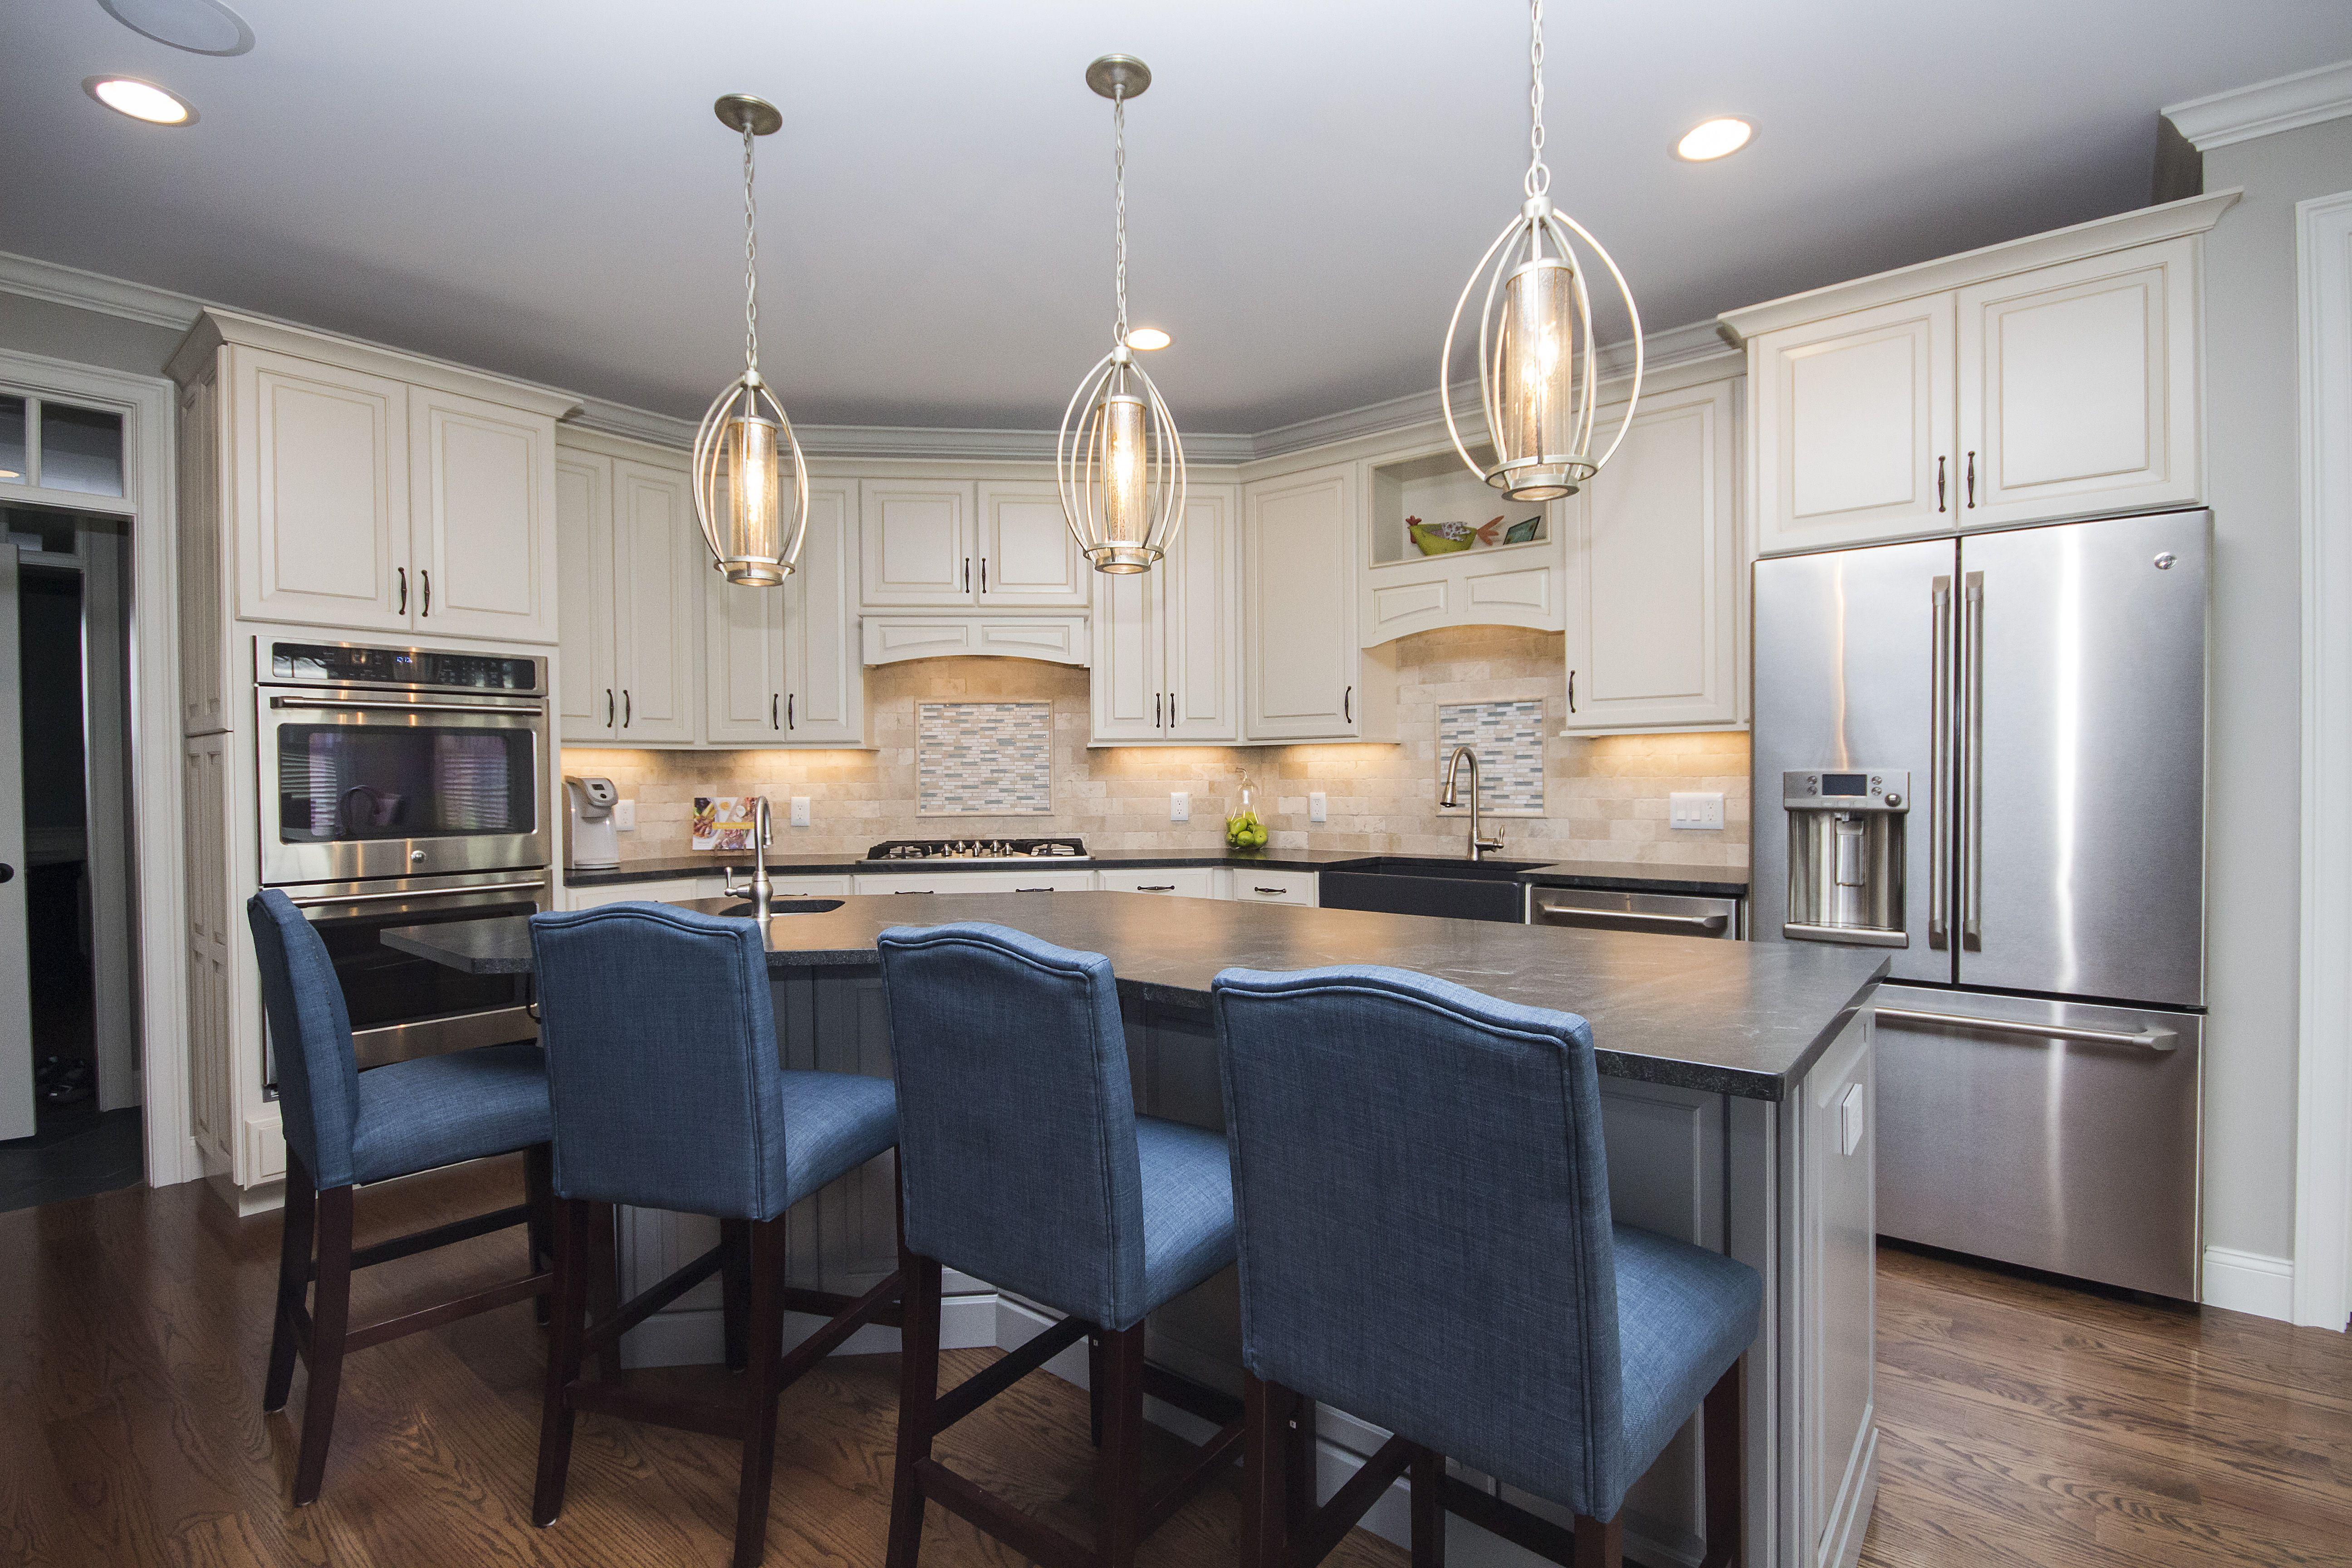 Featuring Cream Cabinetry, Grey Island, Black Granite Countertop, Grey  Farmhouse Sink, Bar Sink, Hanging Jeweled Pendants, Mosaic Blue Glass  Backsplash, ...